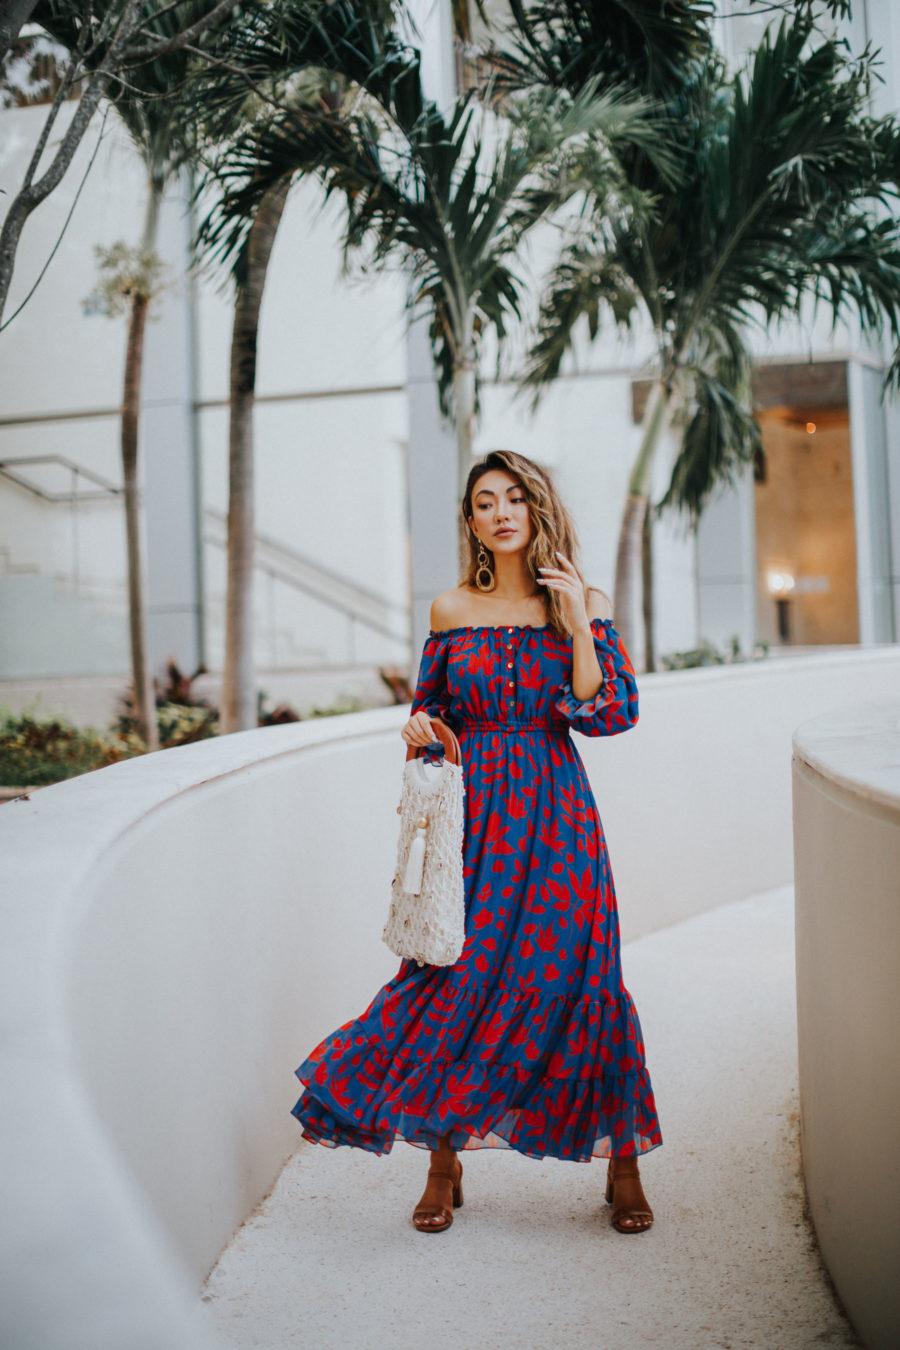 spring 2019 capsule wardrobe - caroline k dress, vacation style // Notjessfashion.com